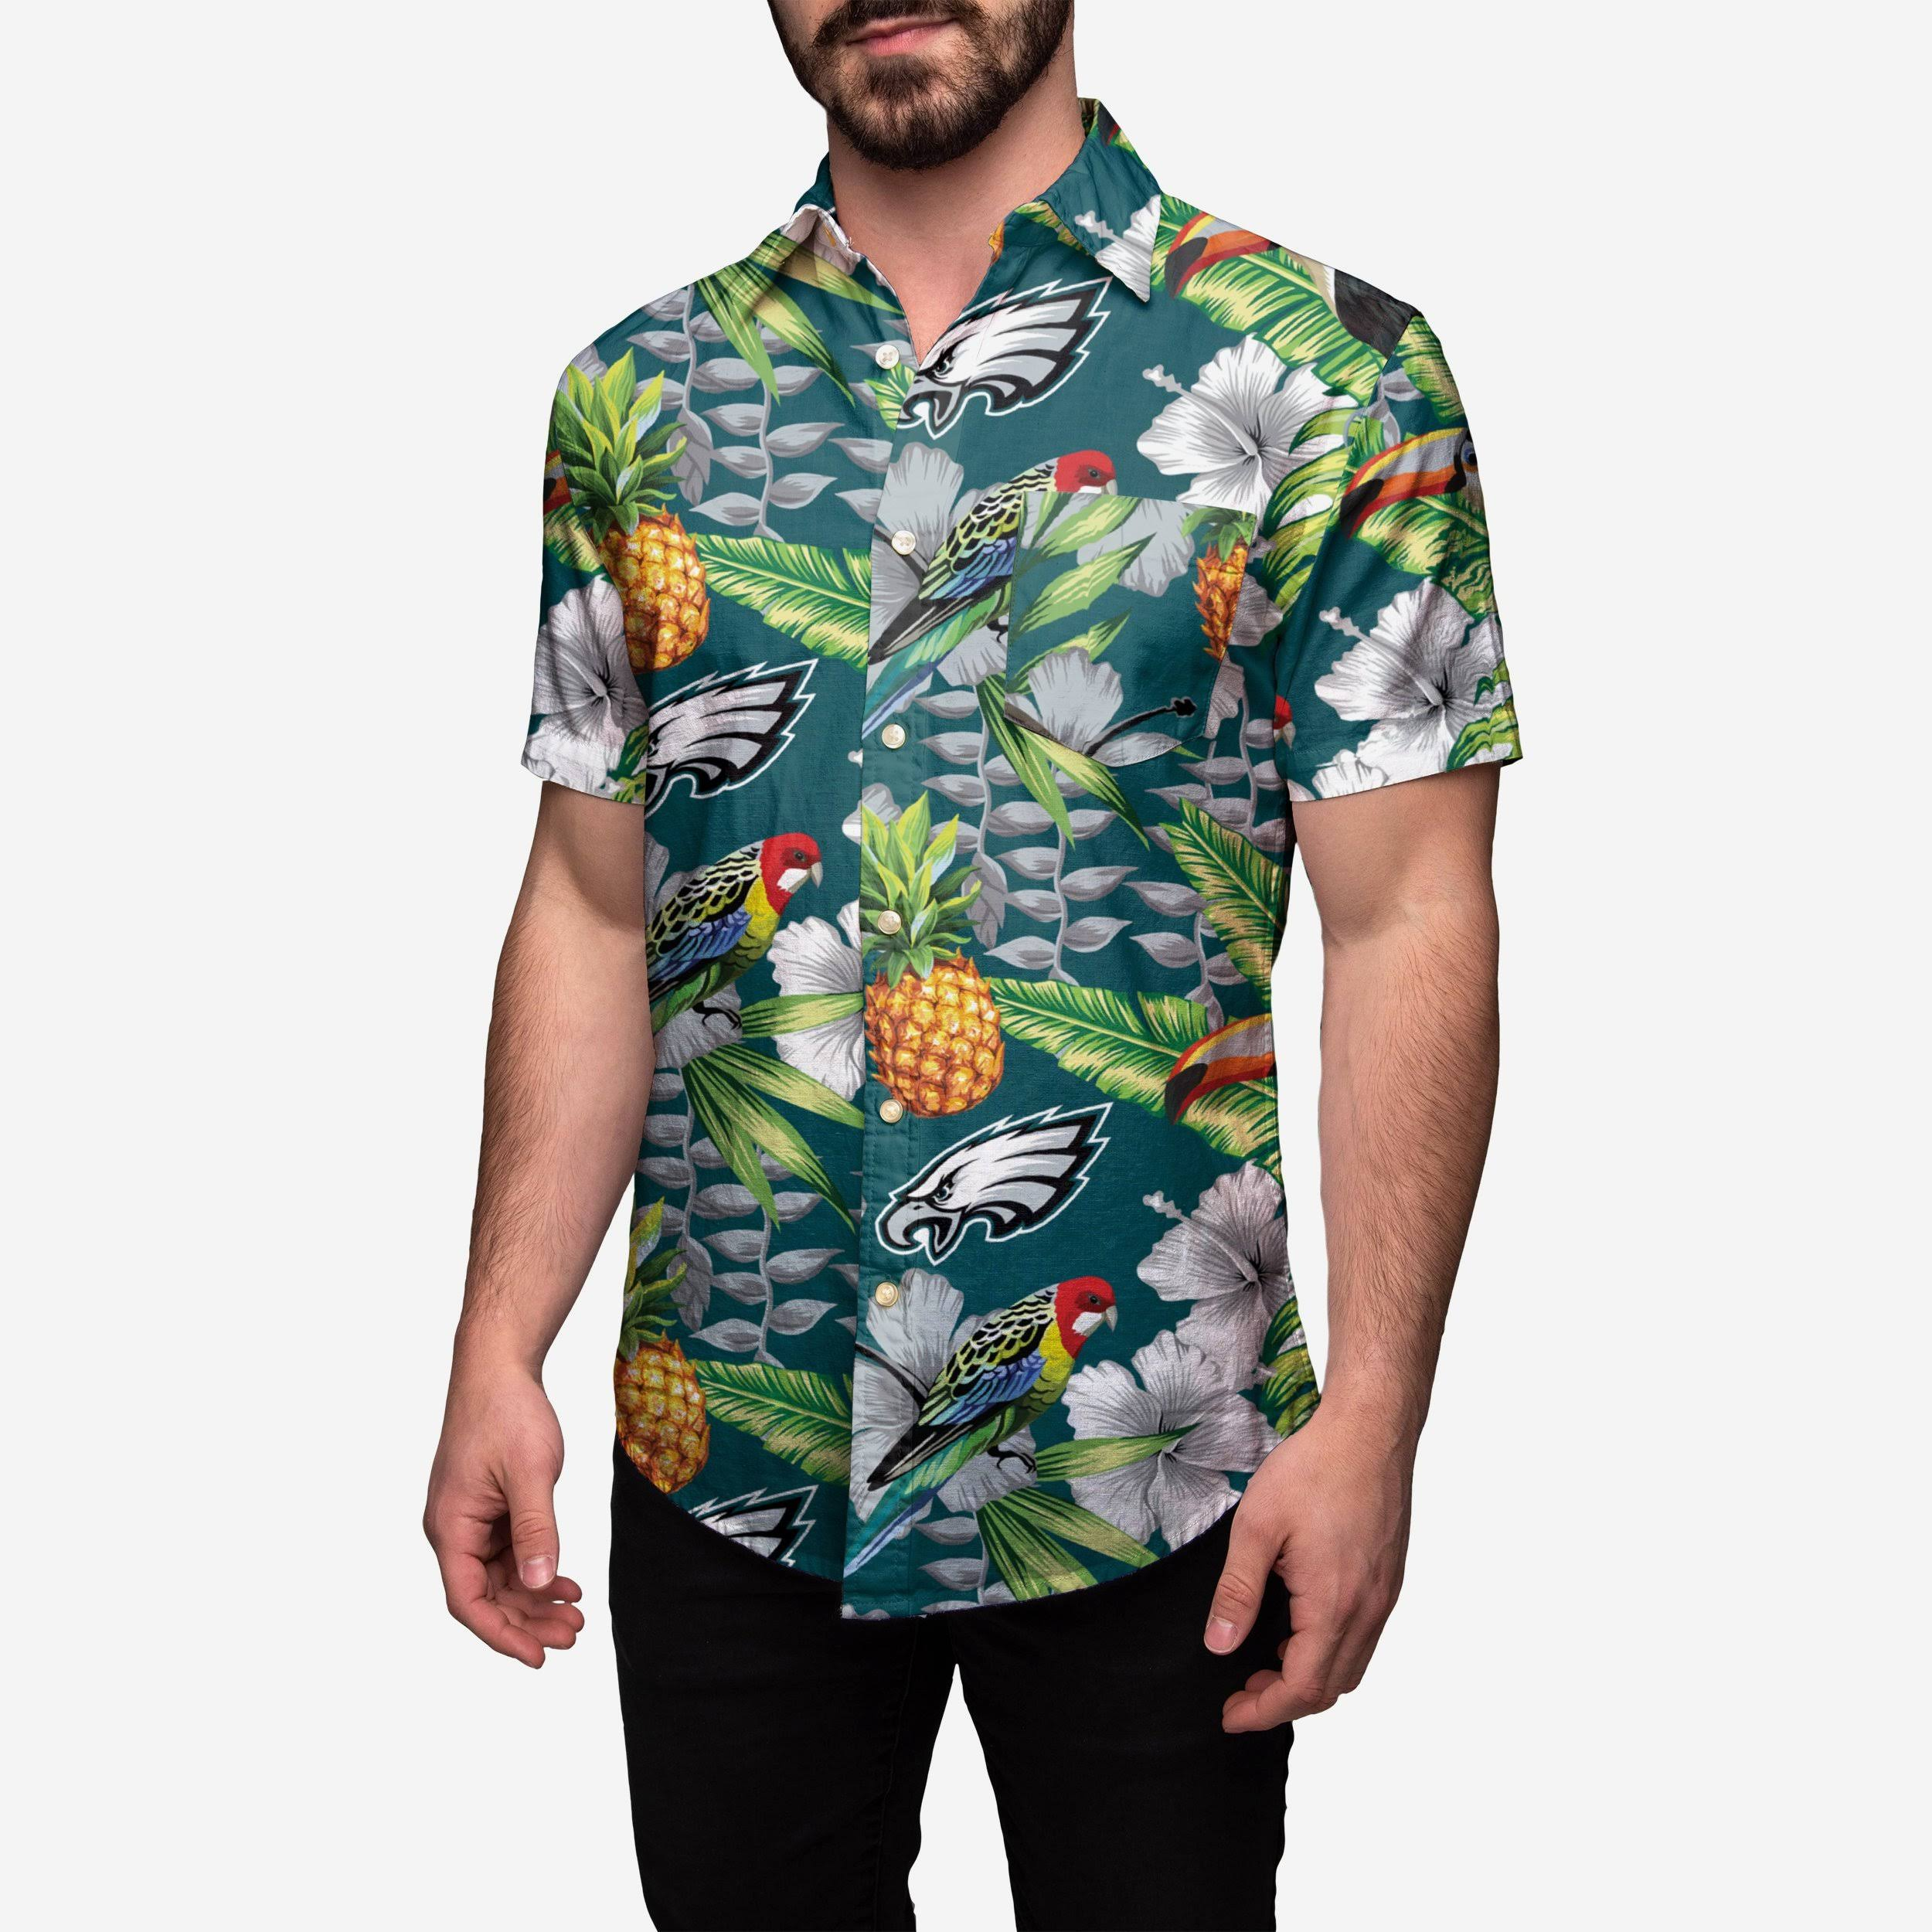 Floral Tropical Camisa Hombres Botón Hasta Nfl 6P51qYxwn